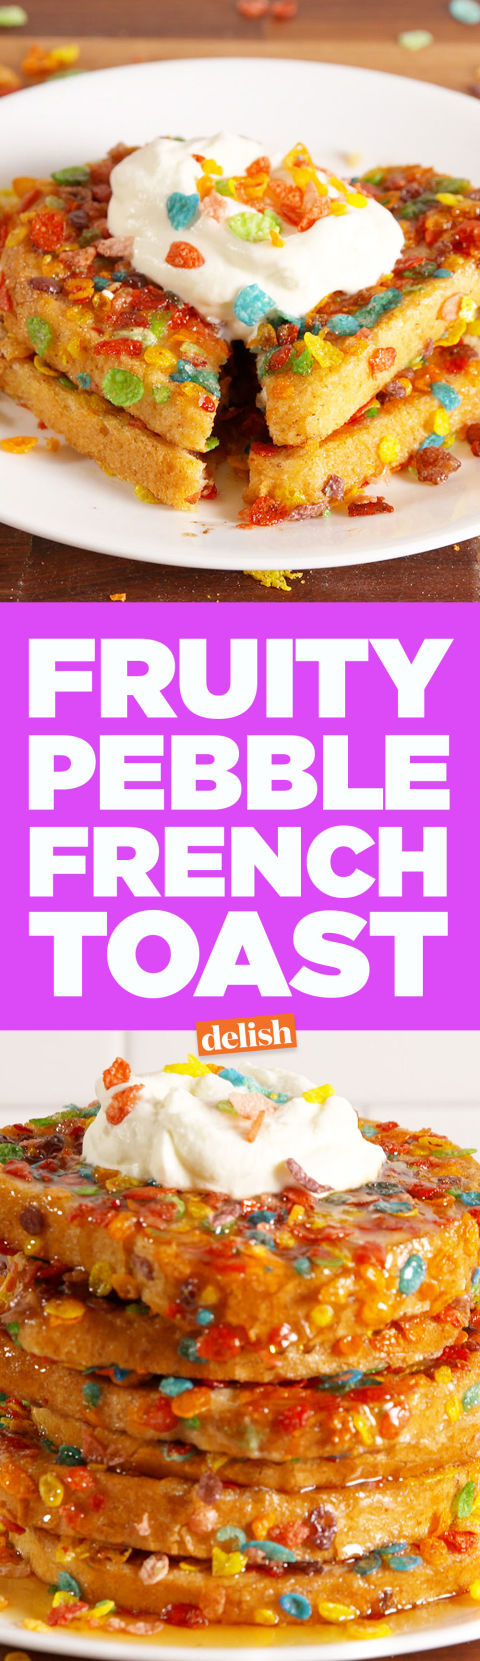 Fruity Pebble French Toast Pinterest